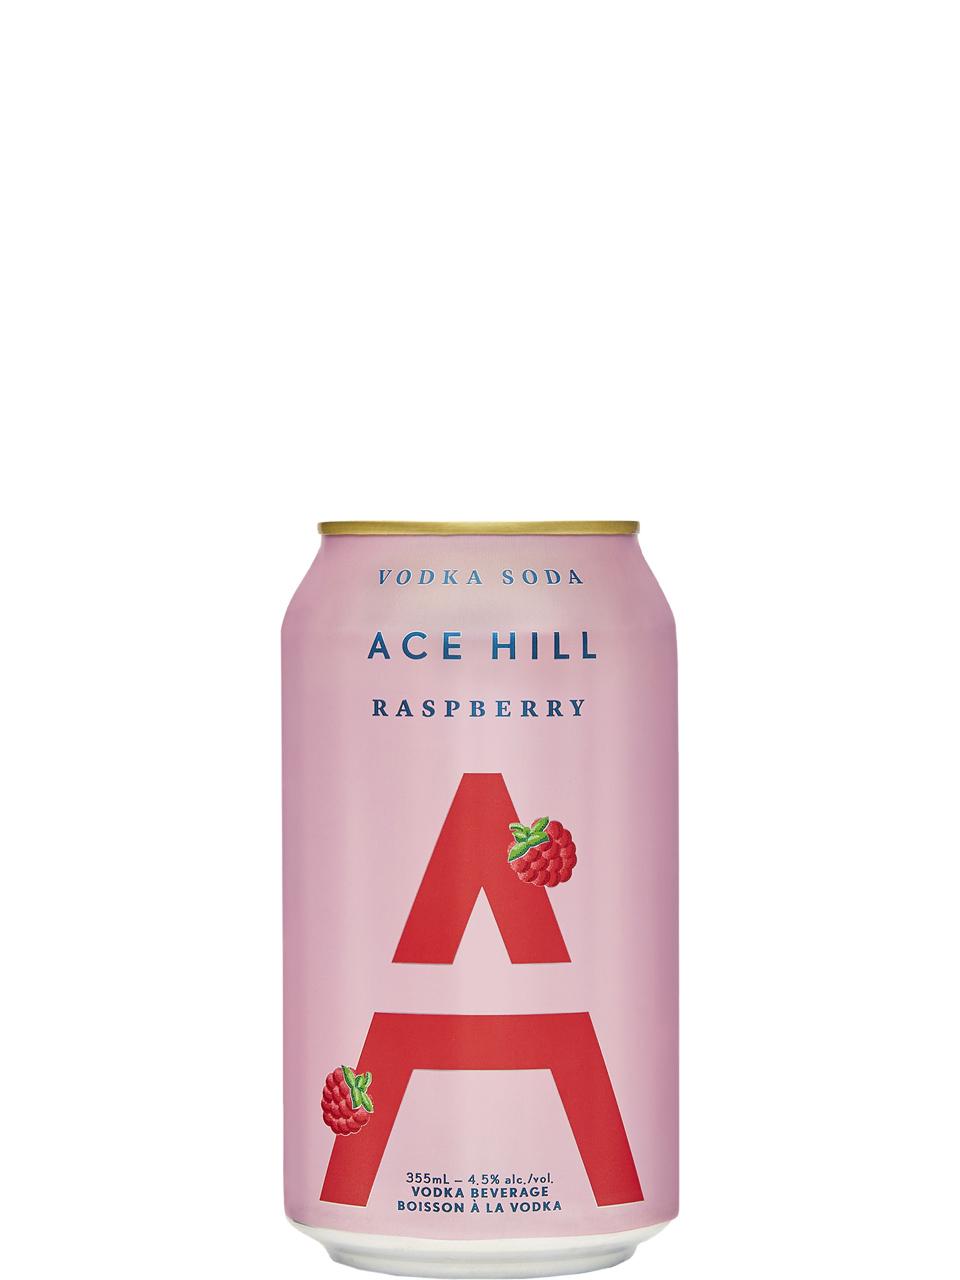 Ace Hill Raspberry Vodka Soda 355ml Can